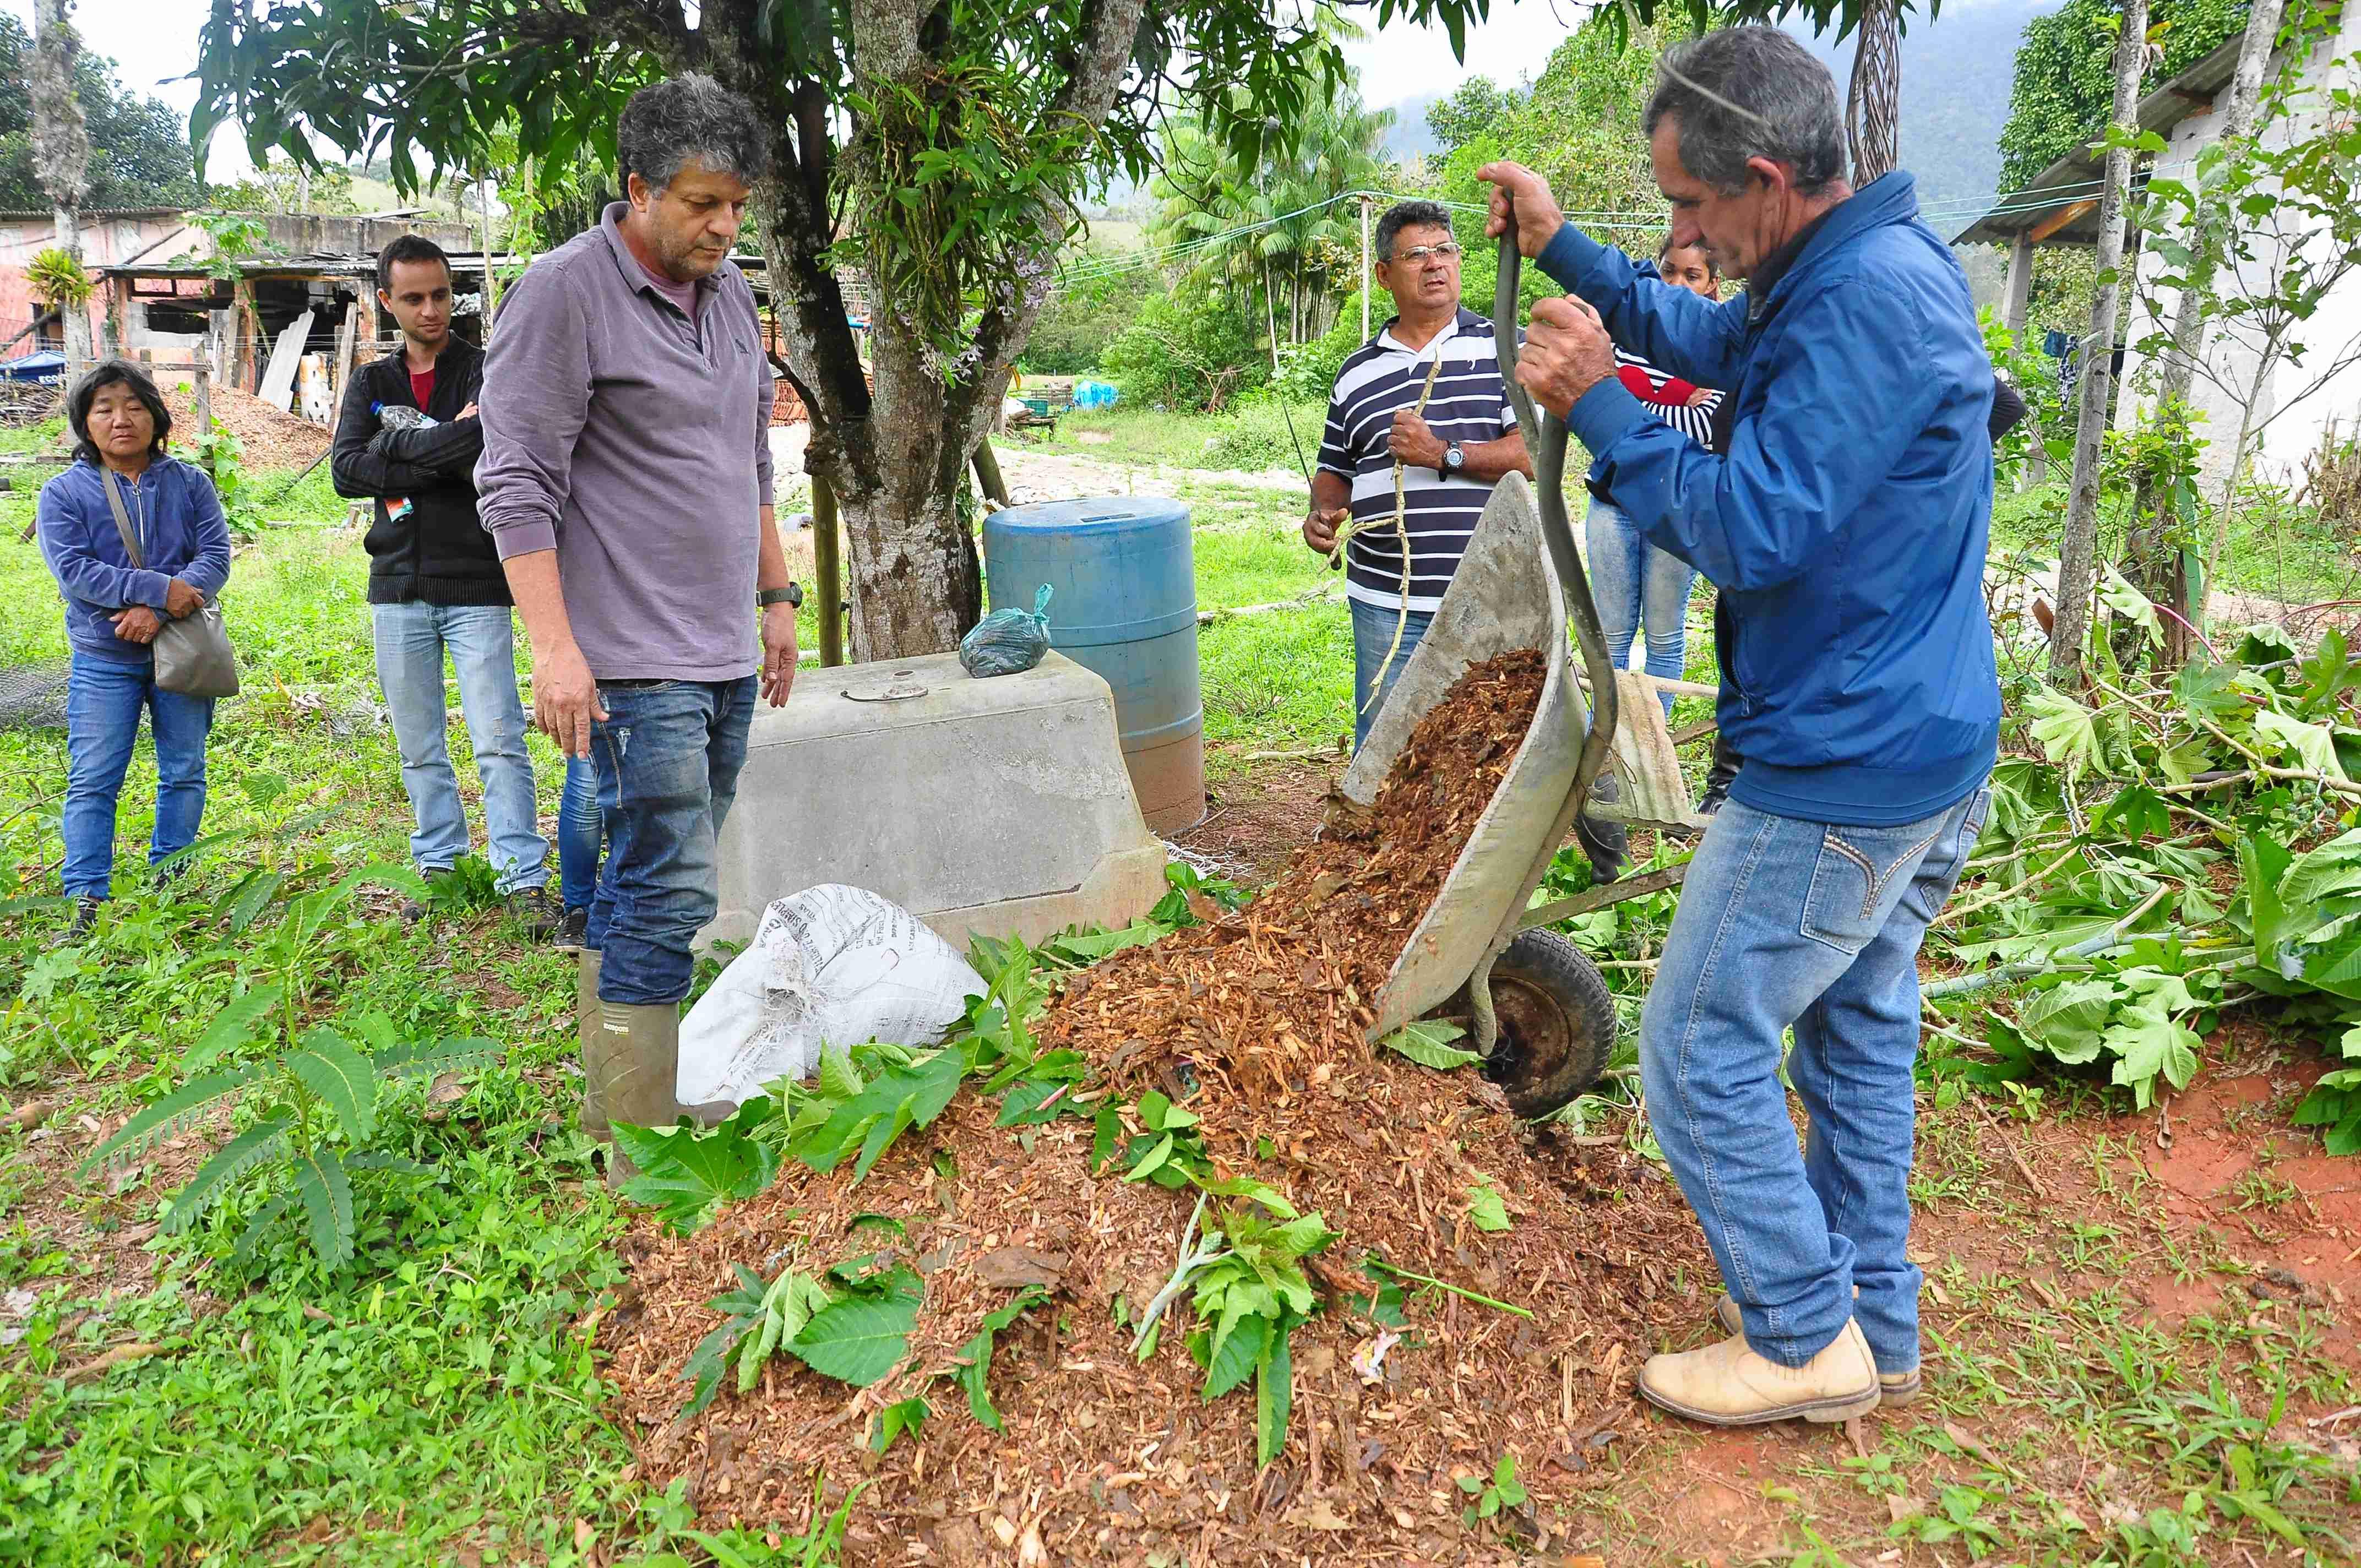 Prefeitura de Caraguatatuba oferece oficina gratuita de compostagem de resíduos